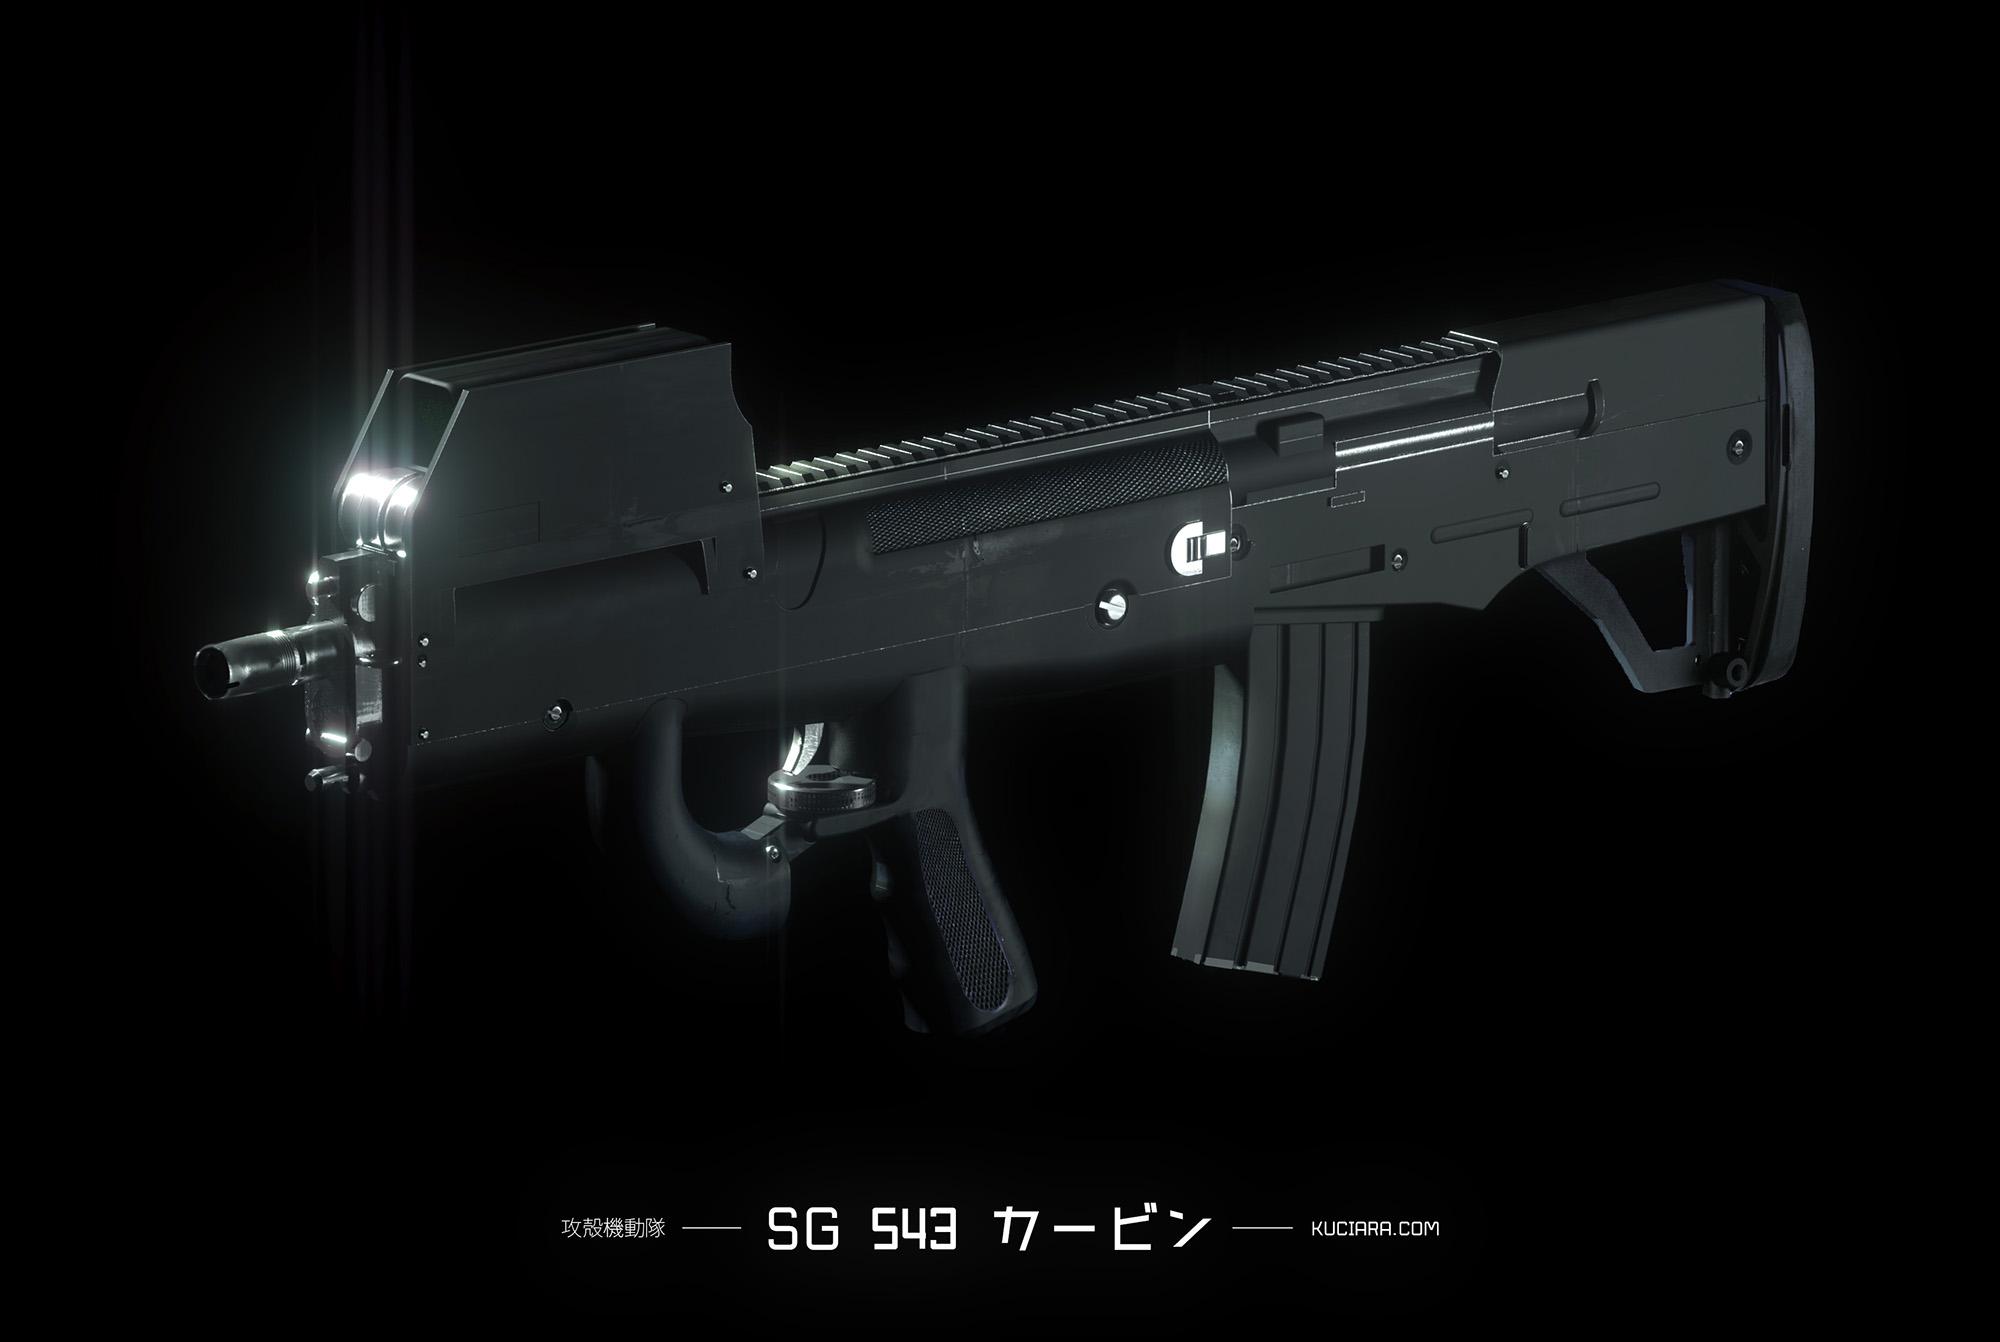 150813_WPN_Rifle_MK_v003.jpg